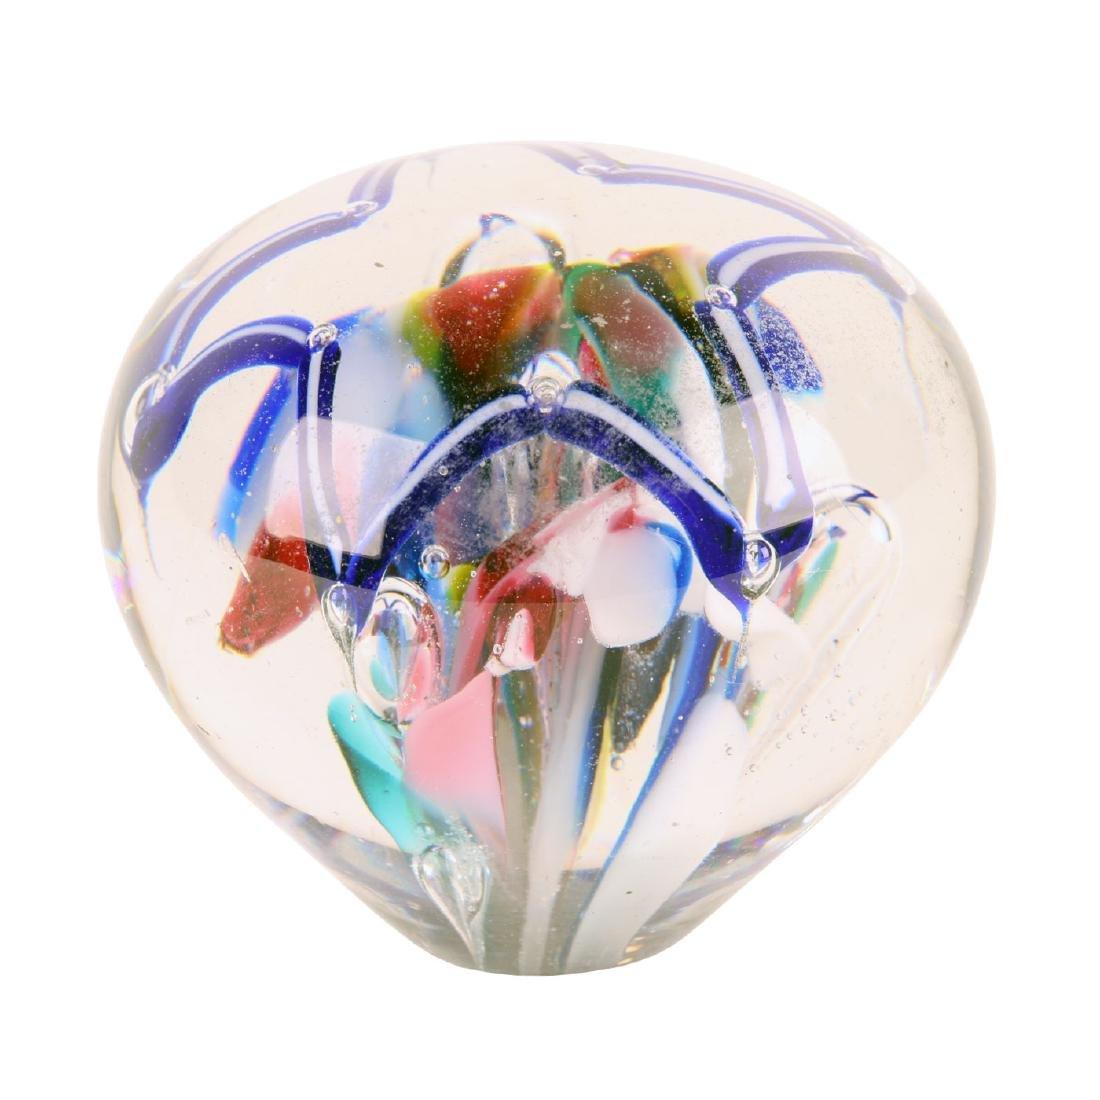 American Art Glass Paperweight